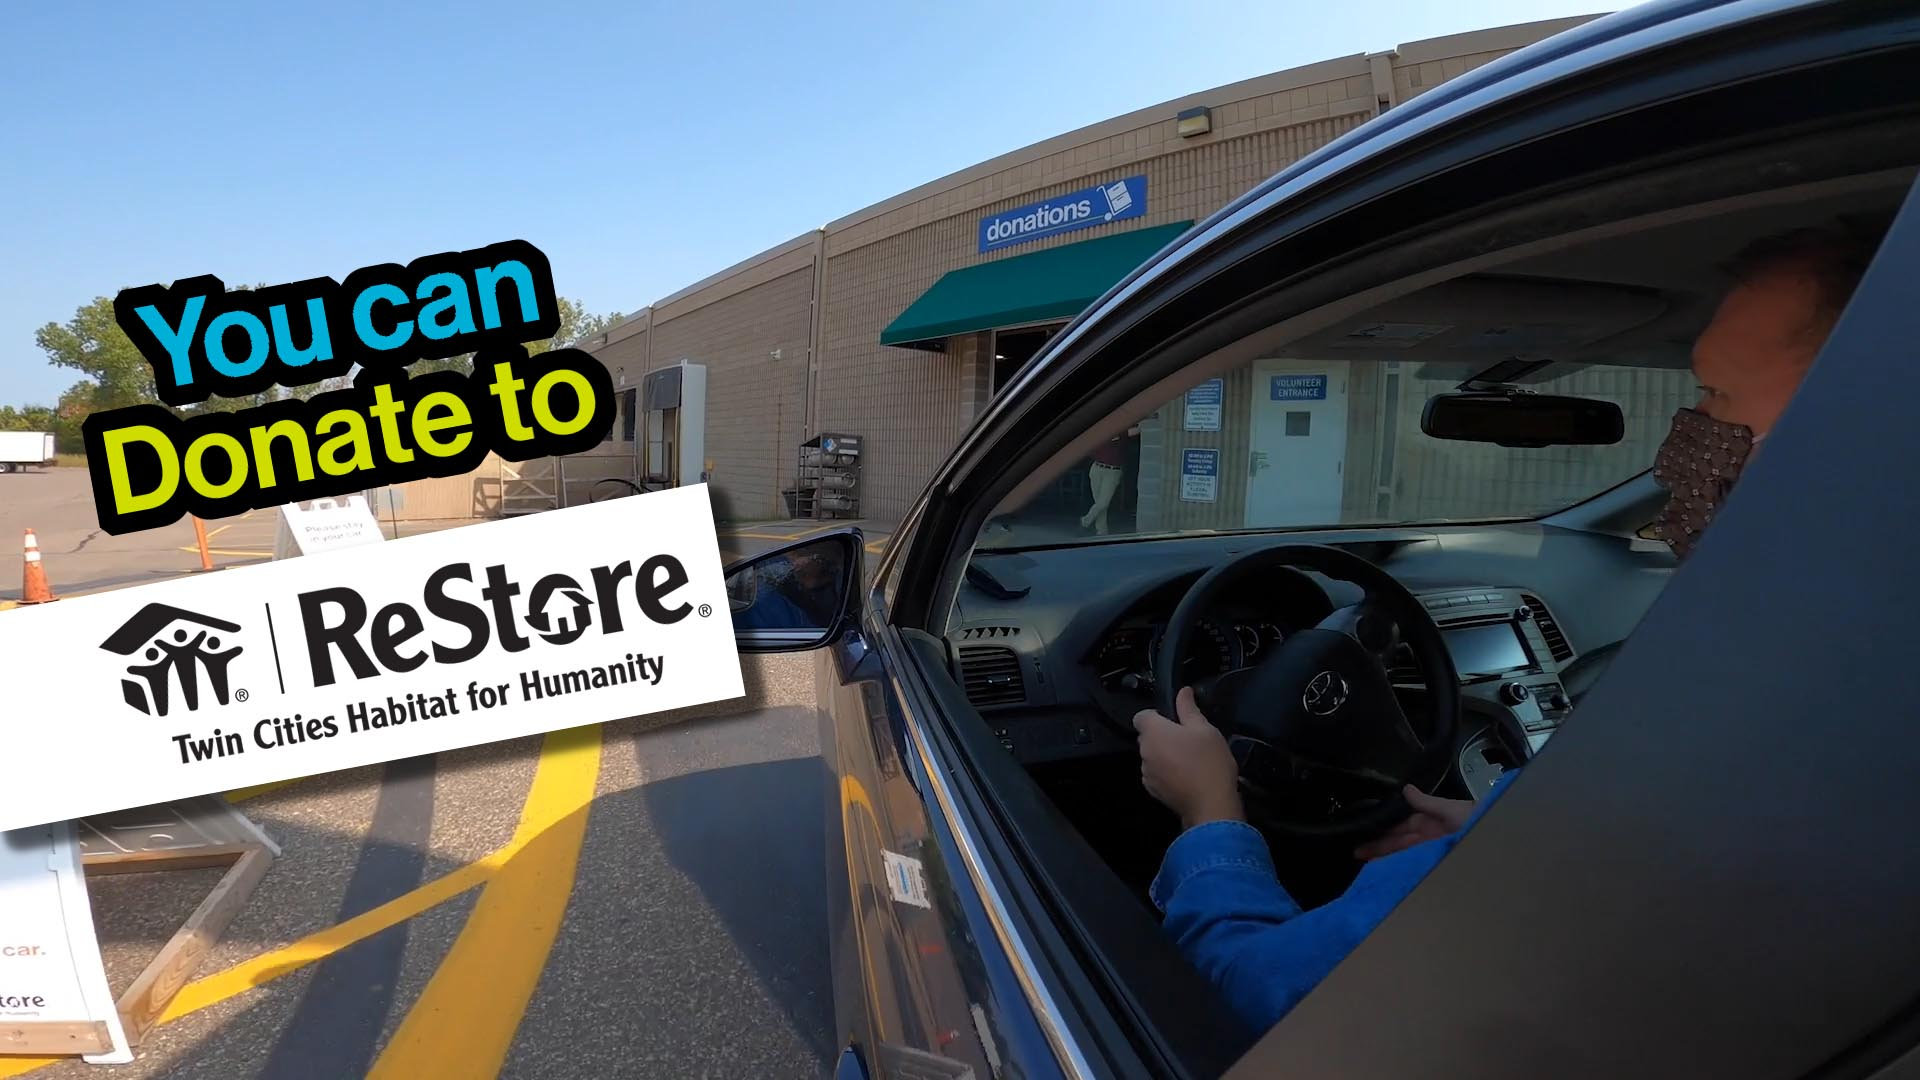 How to Donate to ReStore in 2021 [VIDEO] – Twin Cities Habitat ReStore